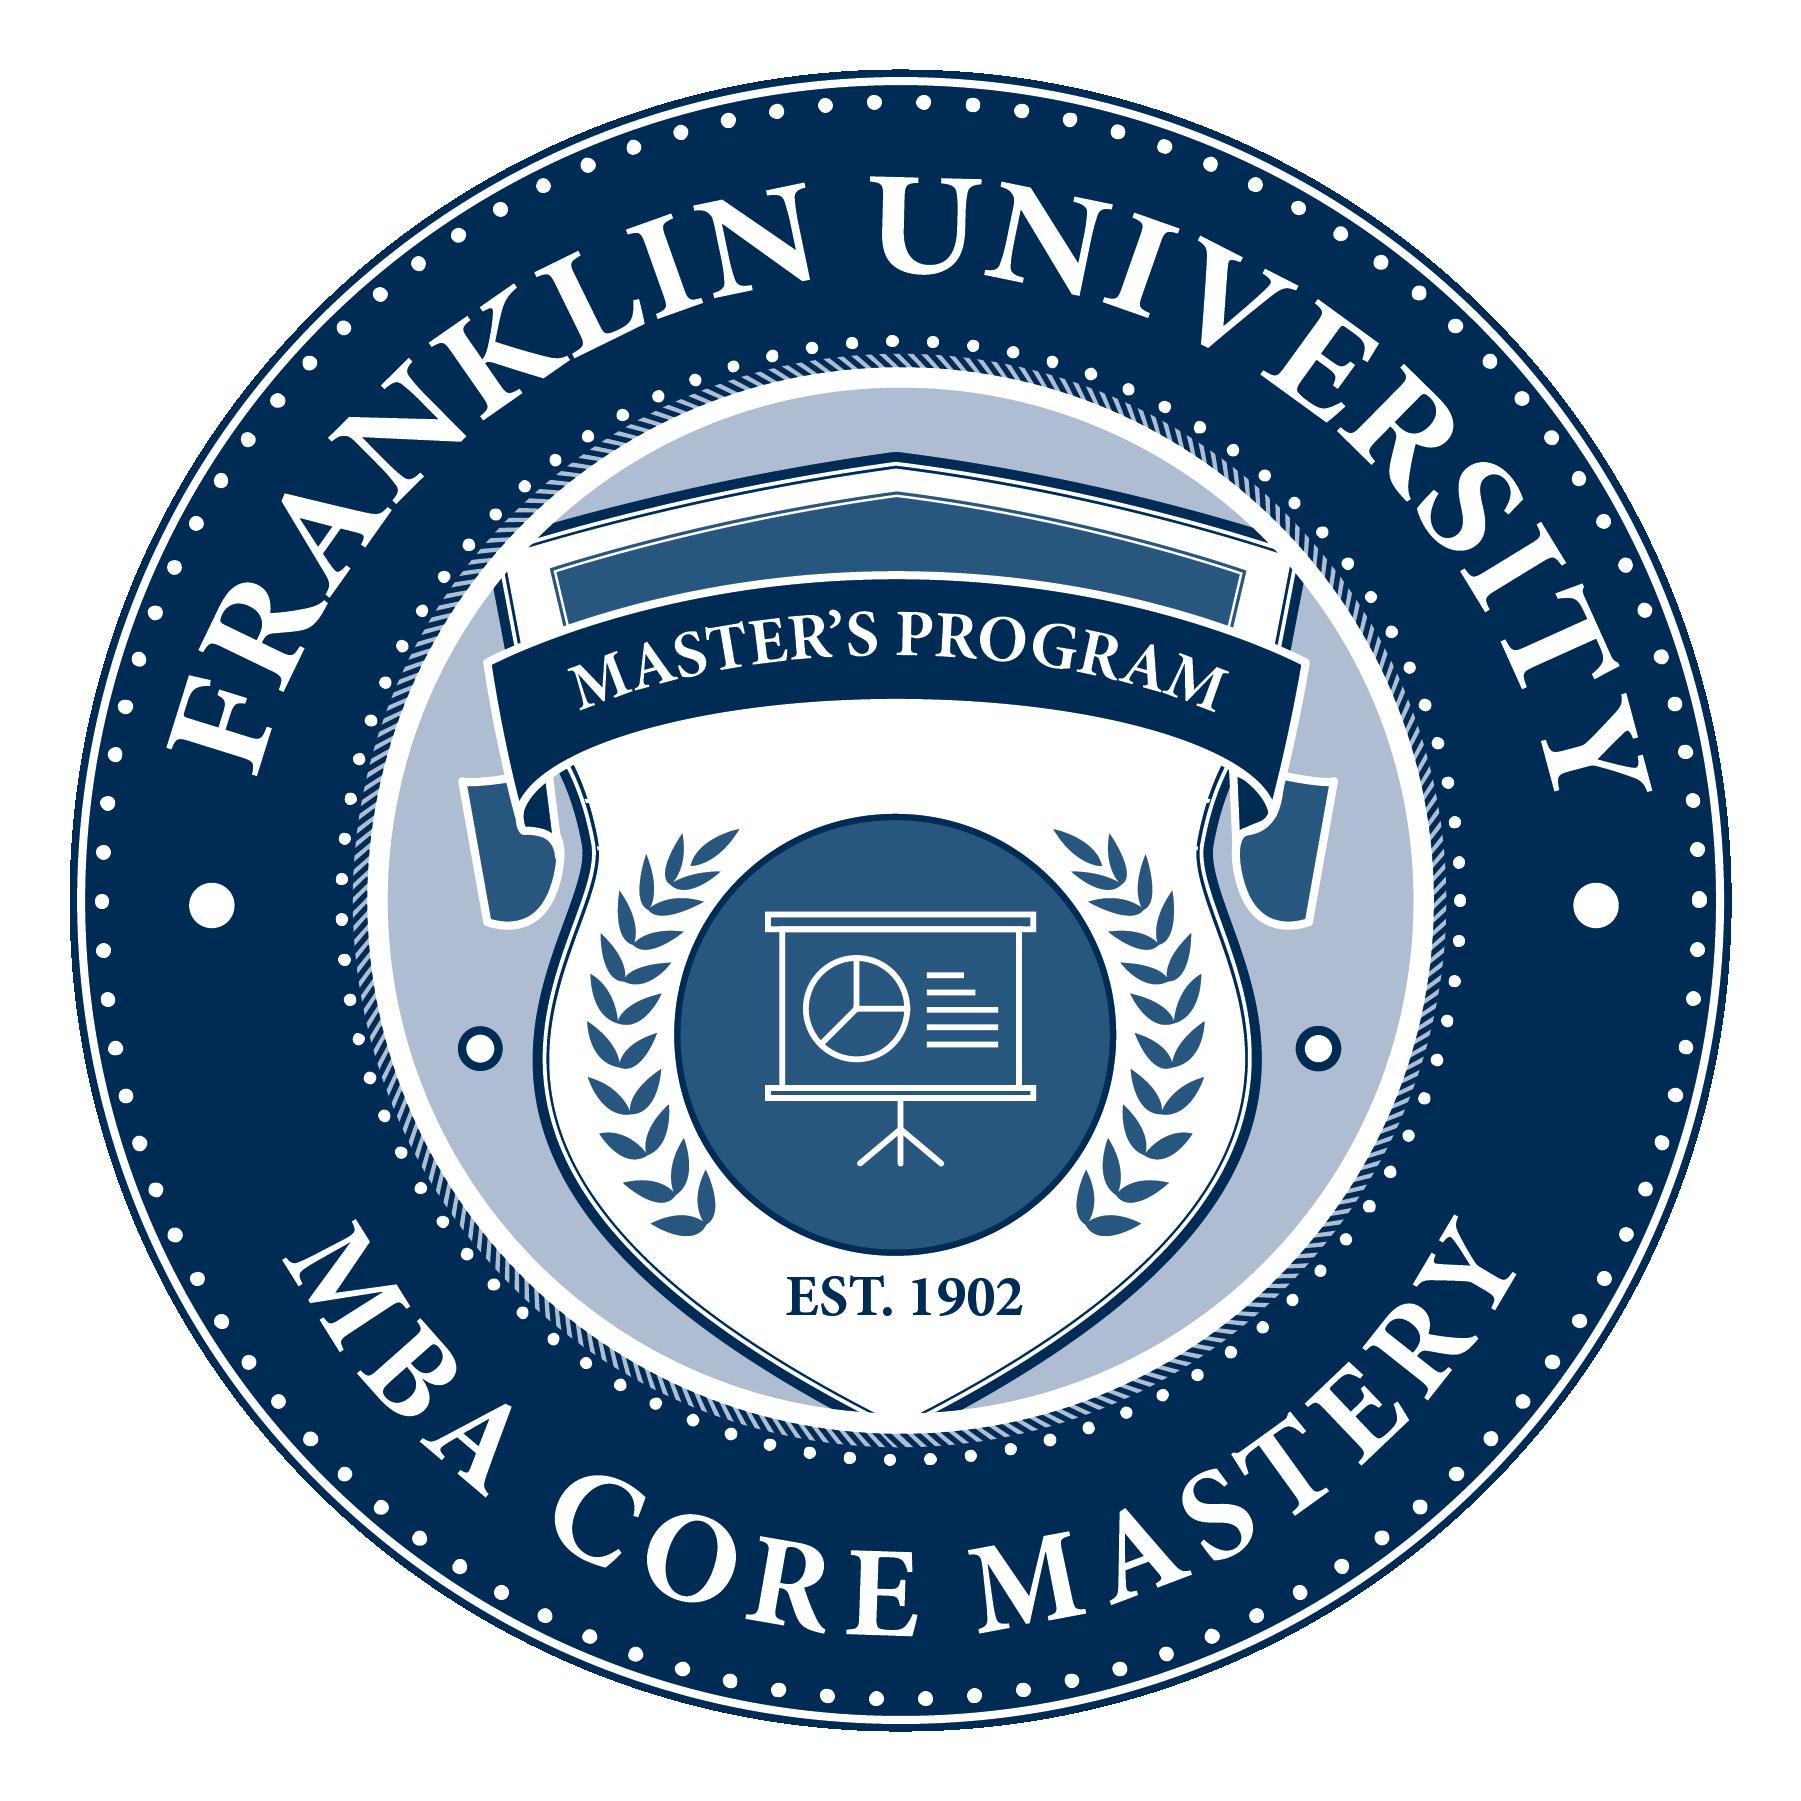 MBA Core Mastery